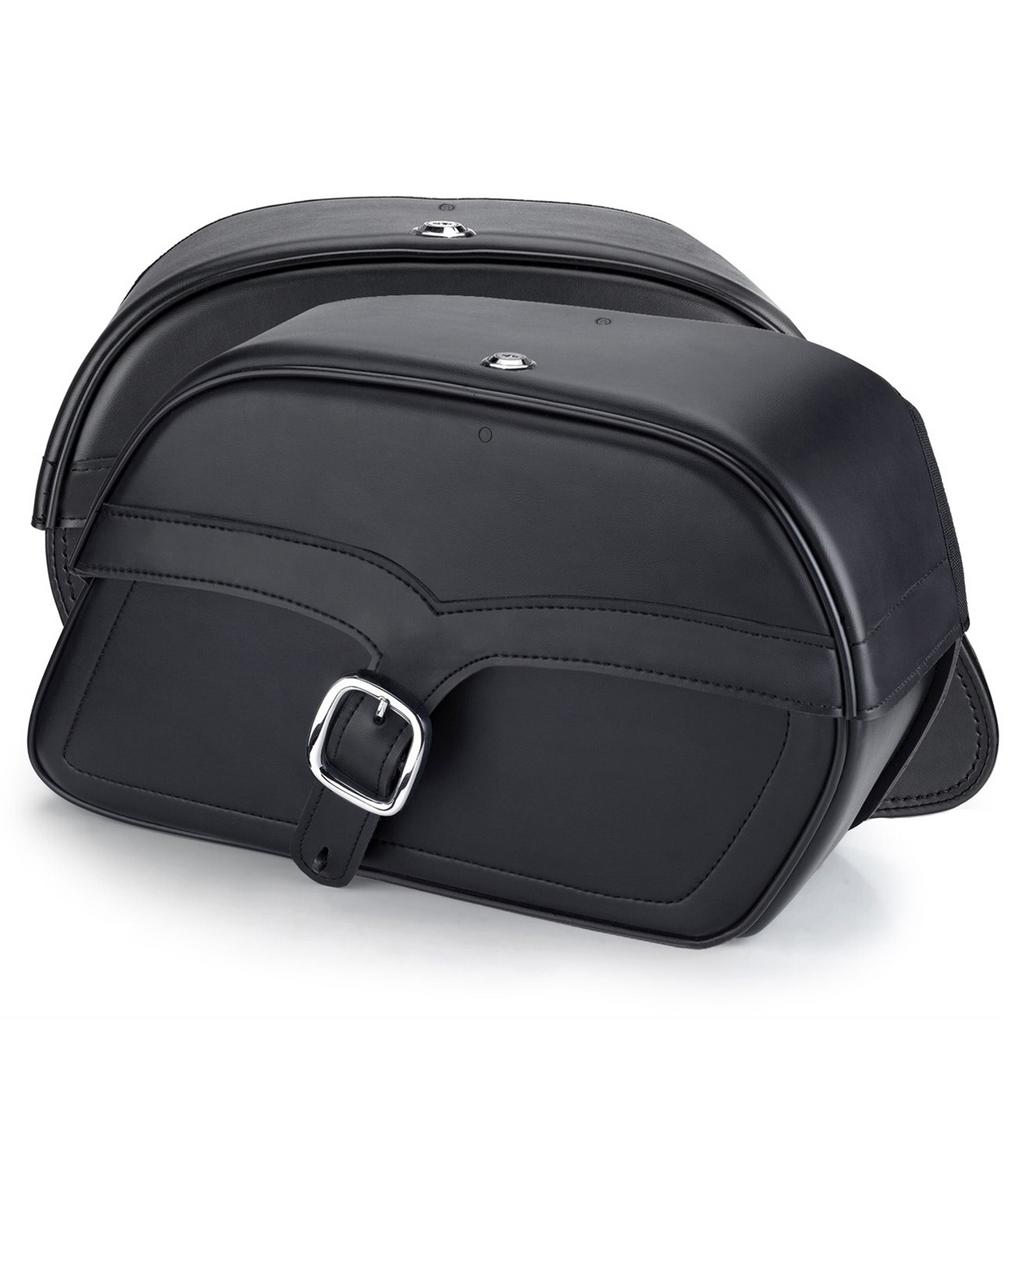 Suzuki Intruder 1500 VL1500 Charger Single Strap Large Motorcycle Saddlebags Both Bags View